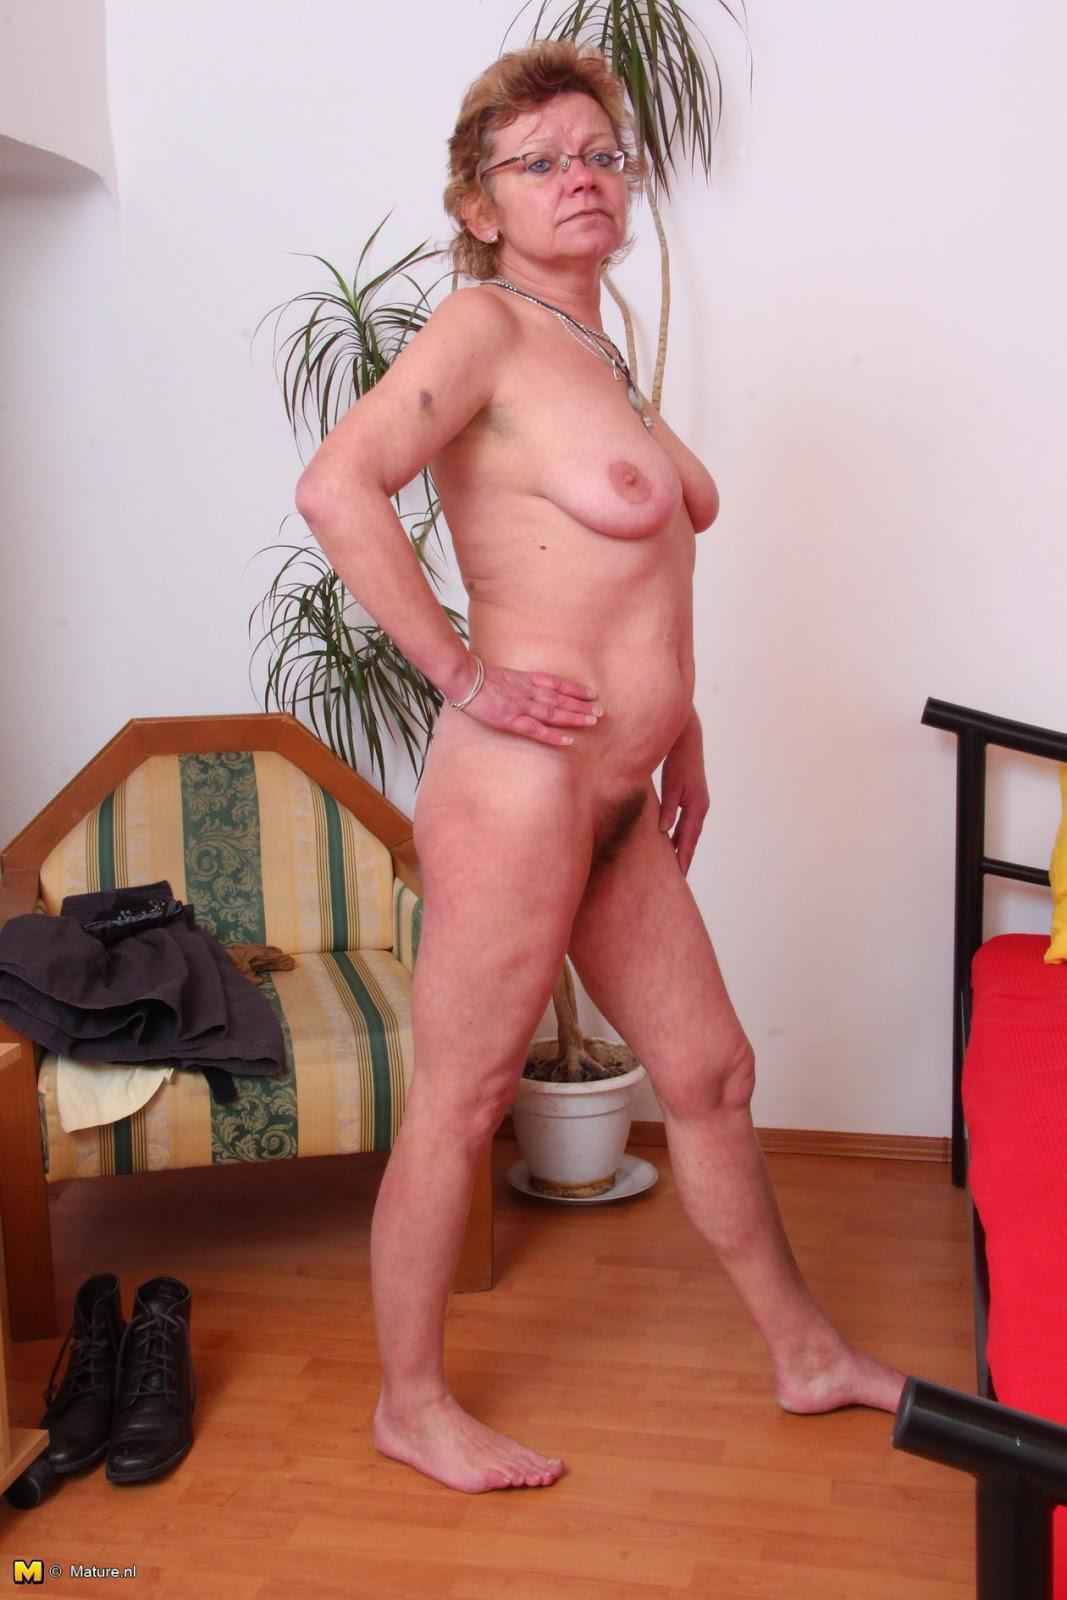 Brantford nude girls